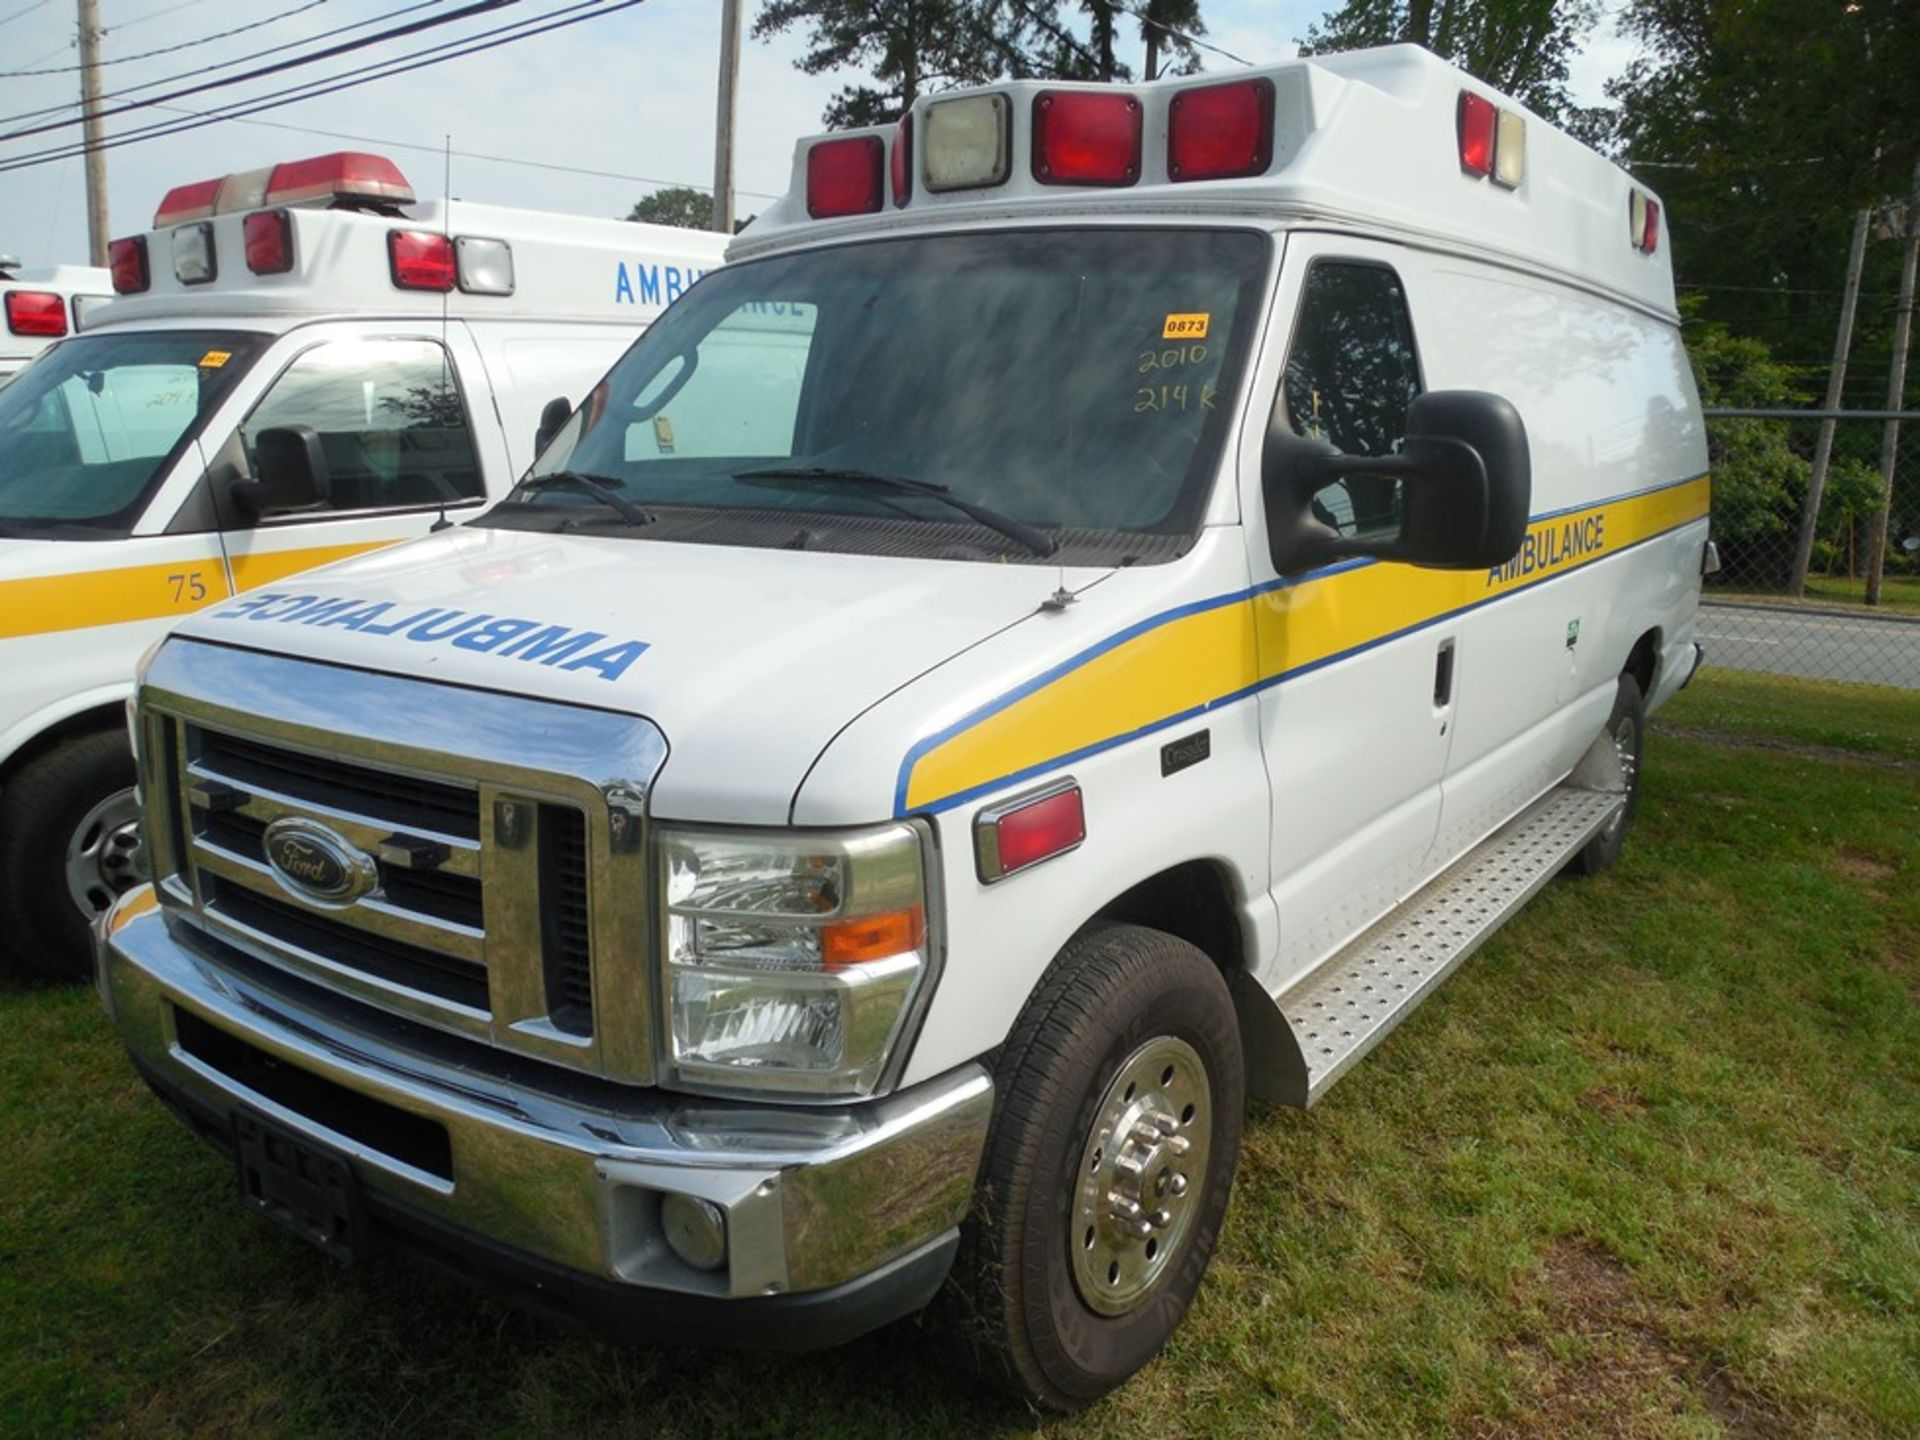 2010 Ford E350 Crusader Wheel Coach van ambulance 214,465 miles vin# 1FDSS3EP9ADA32493 - Image 2 of 6